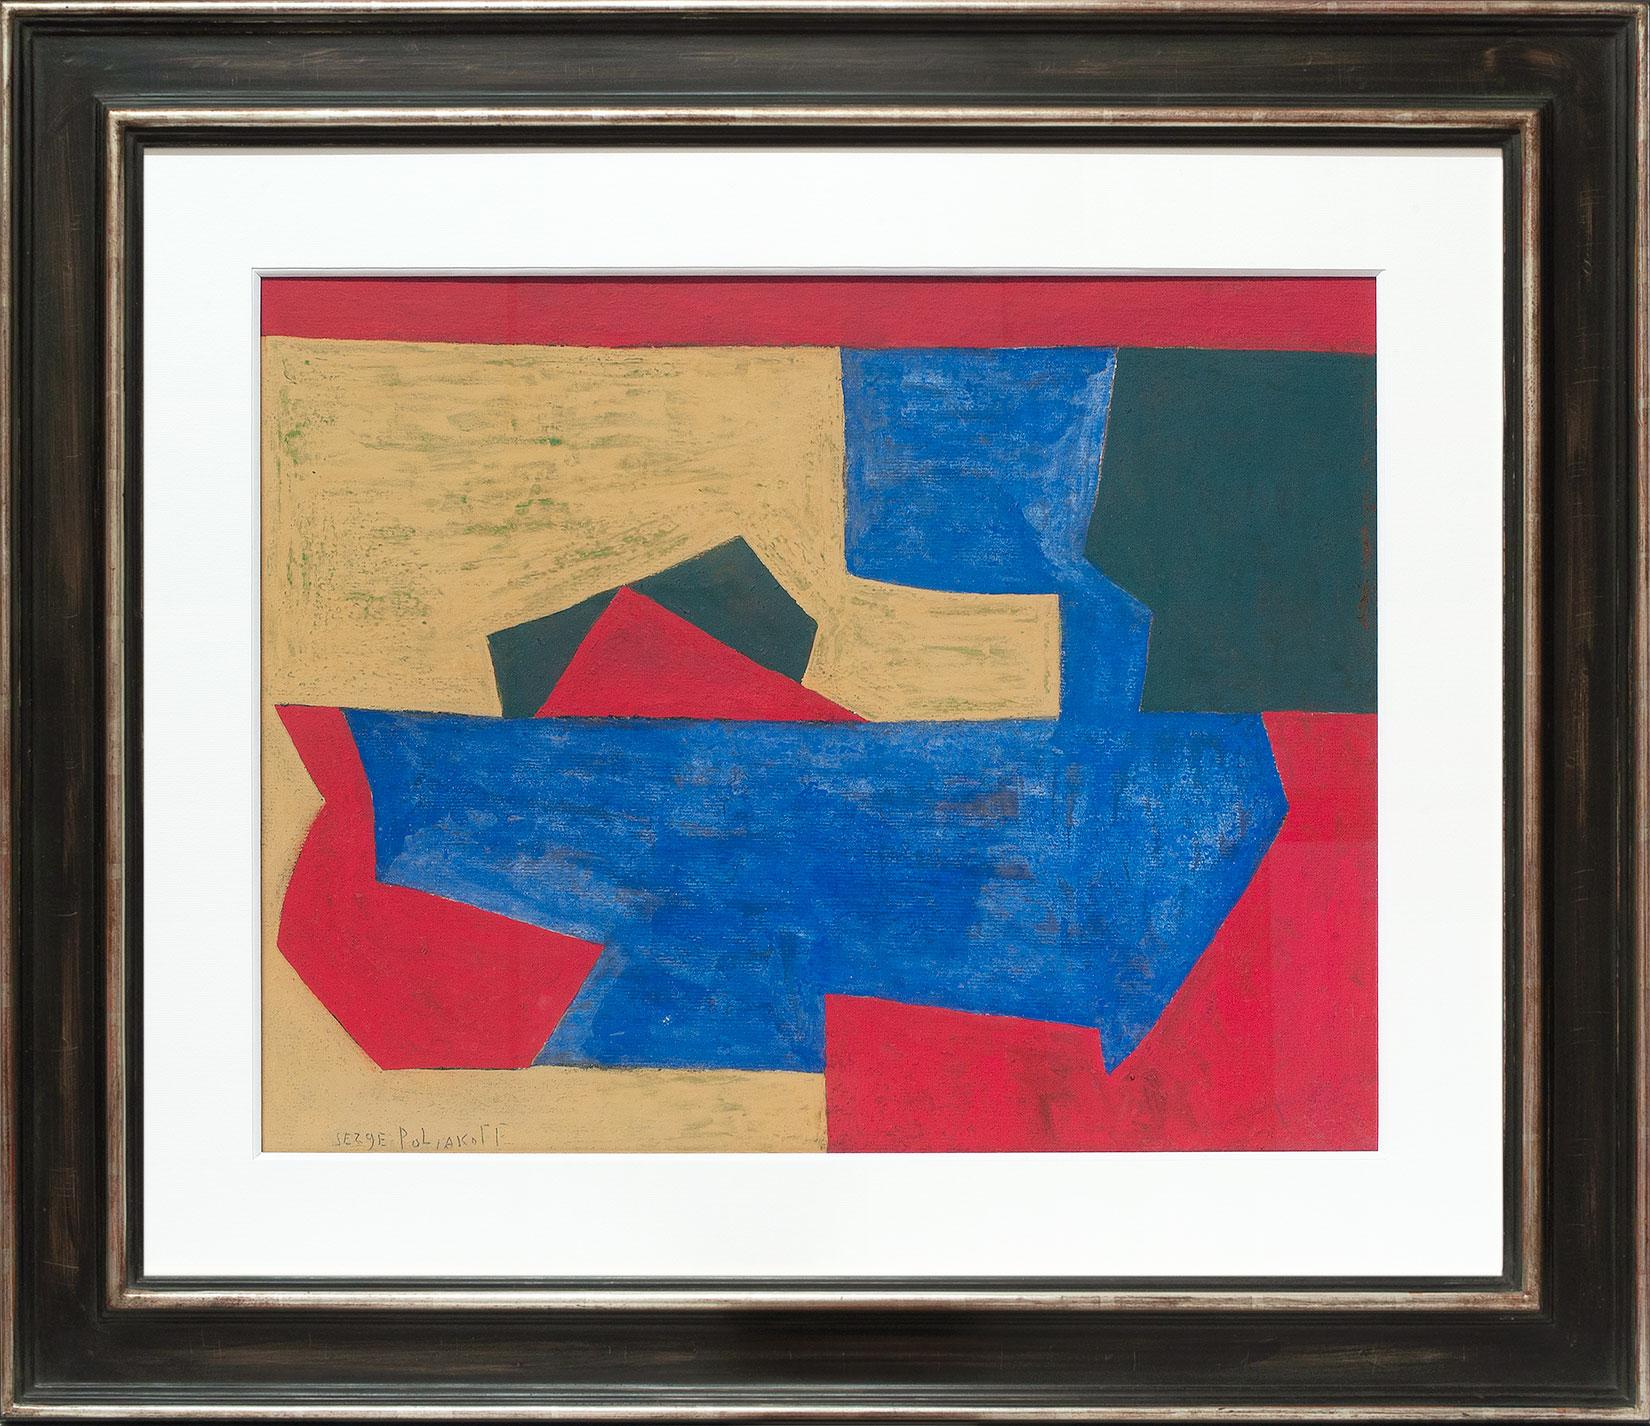 Serge Poliakoff «Composition abstraite» Galerie Française